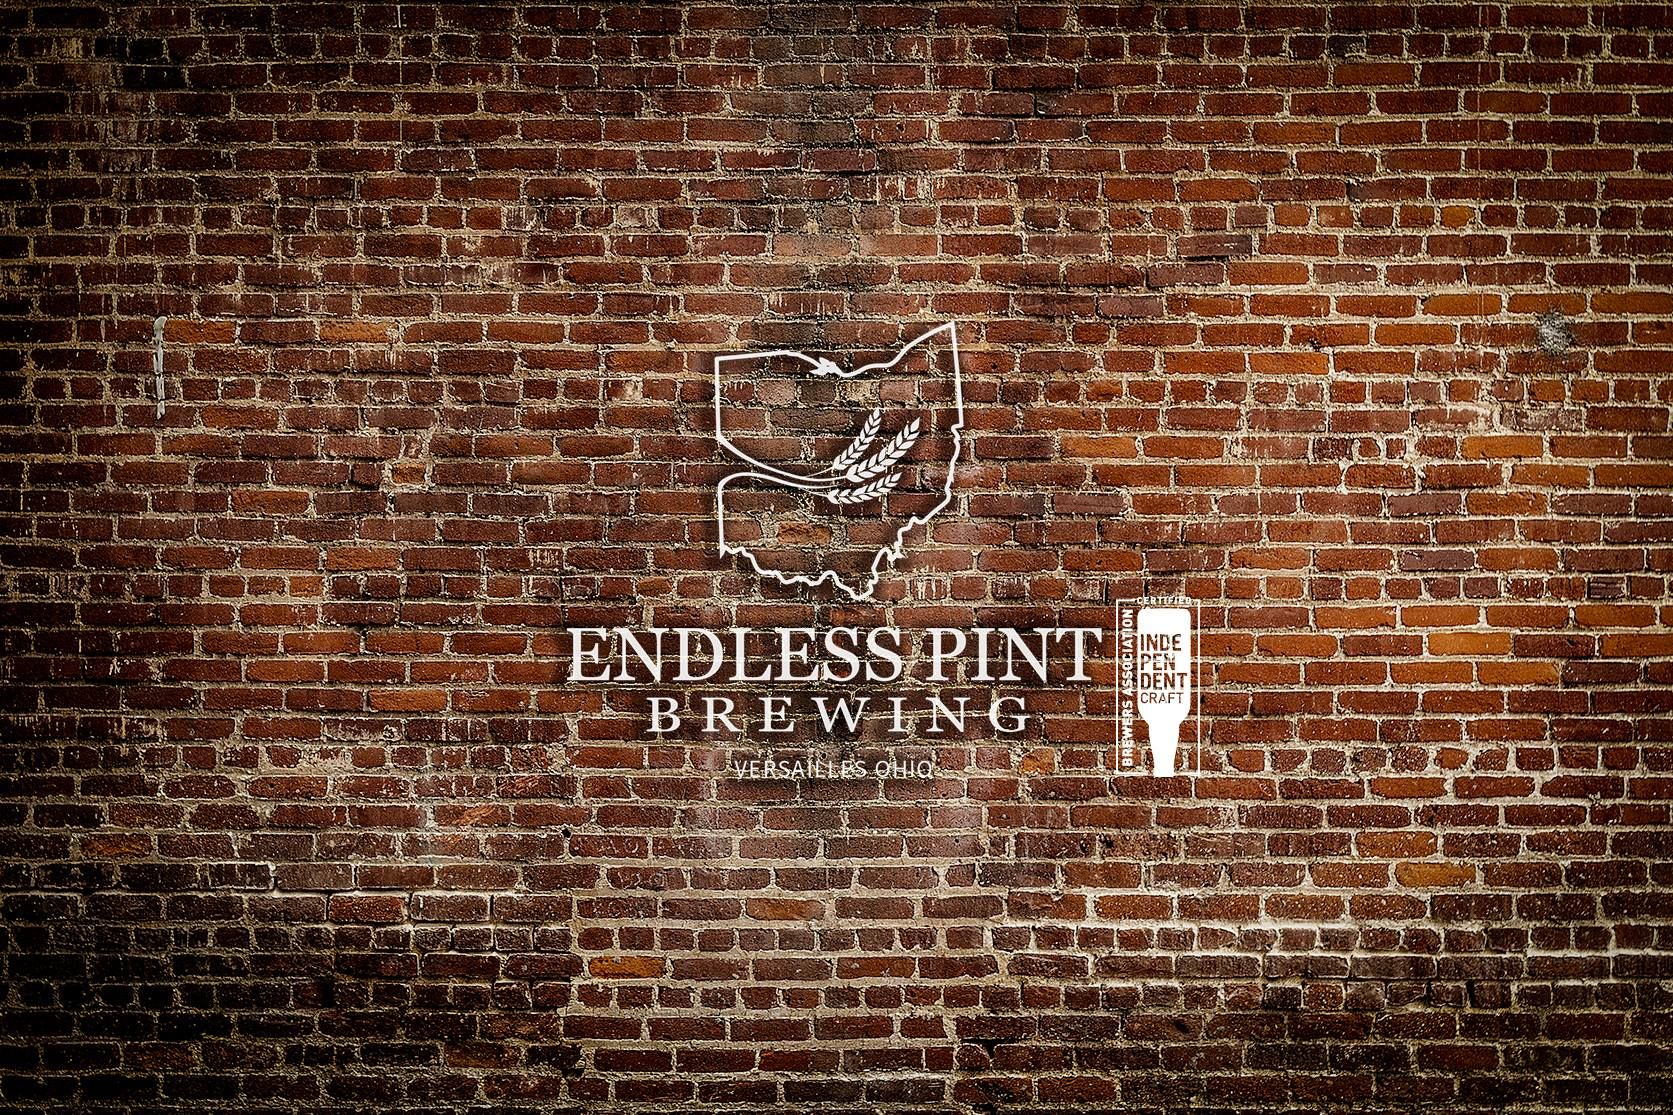 Endless Pint